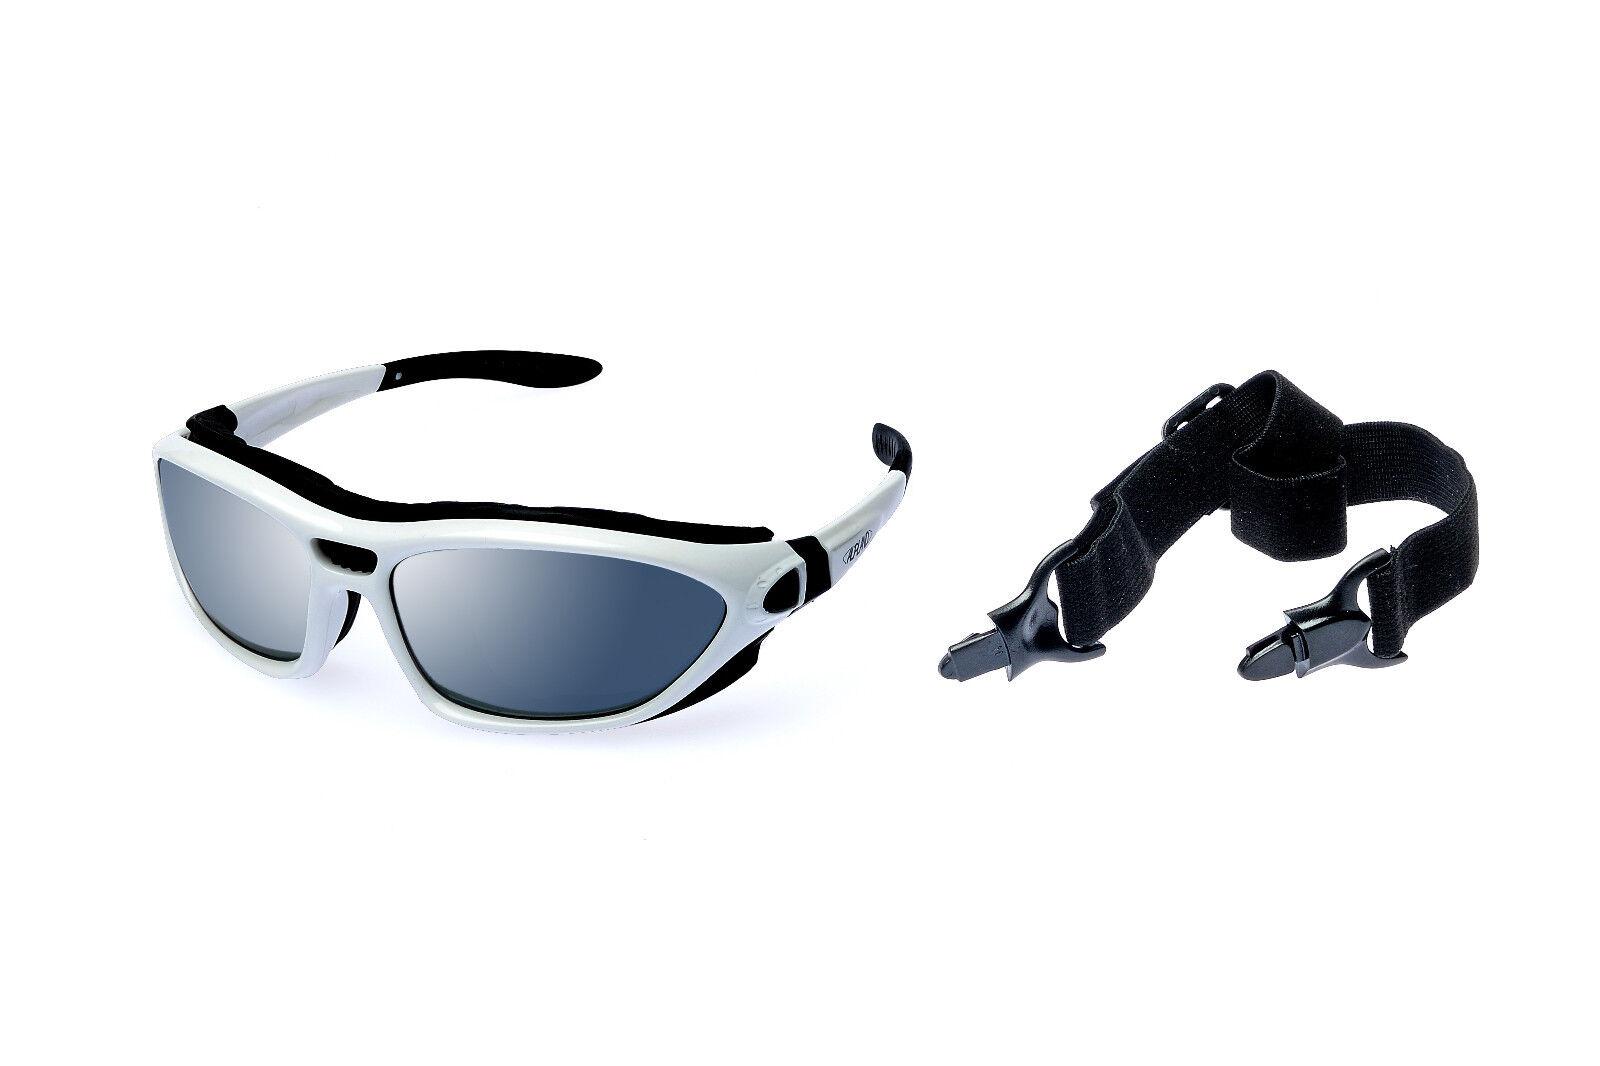 alpland Lunettes de neige ski ski ski Alpine sport protection soleil d8526b